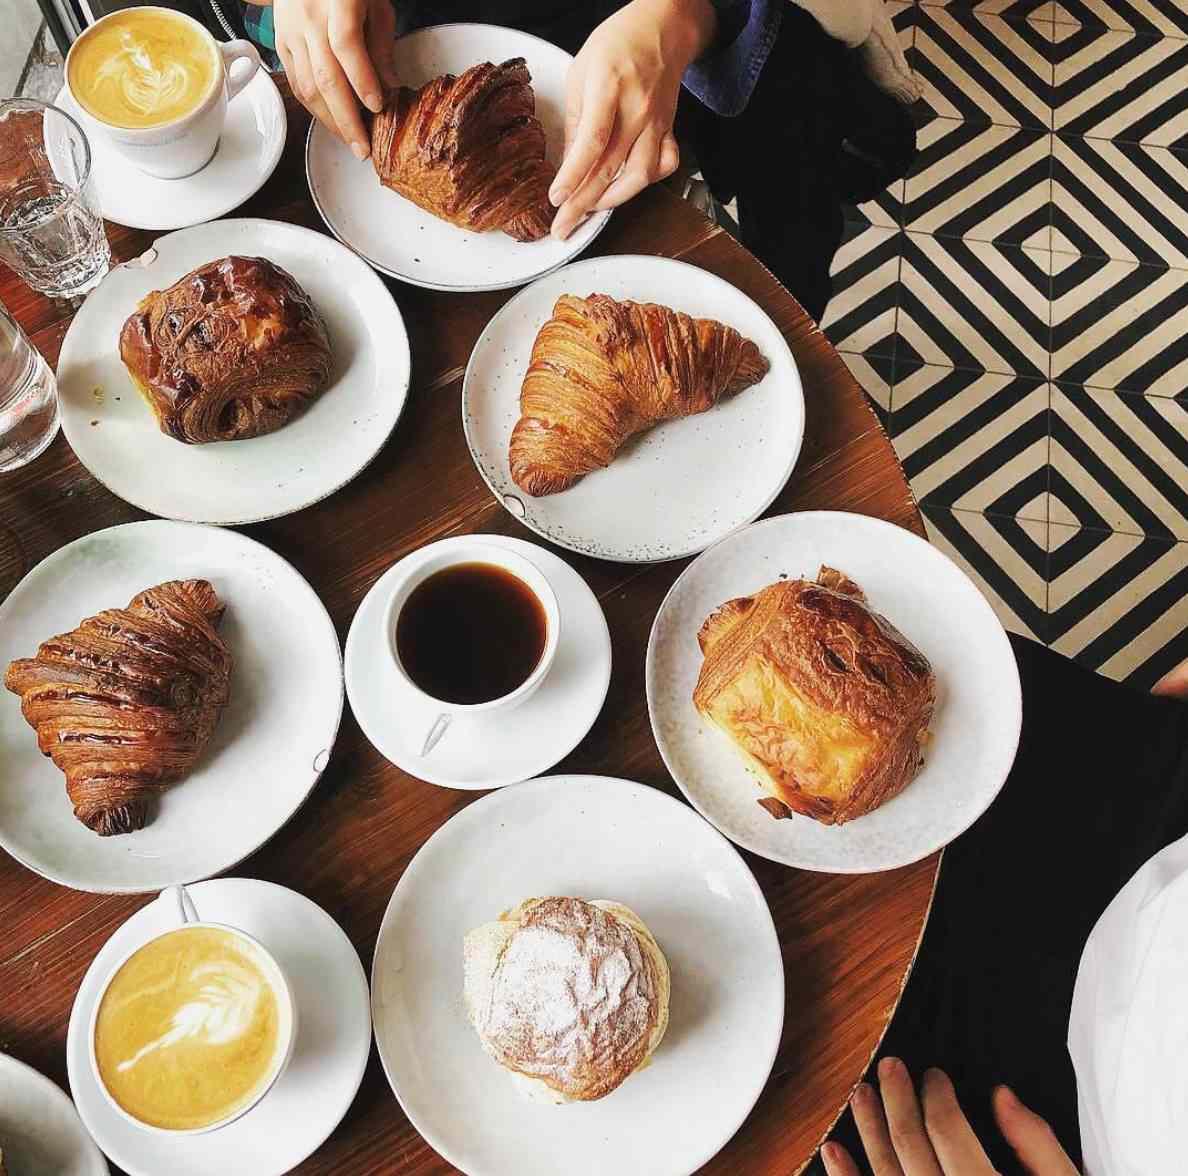 Breakfast at Mirabelle Bakery